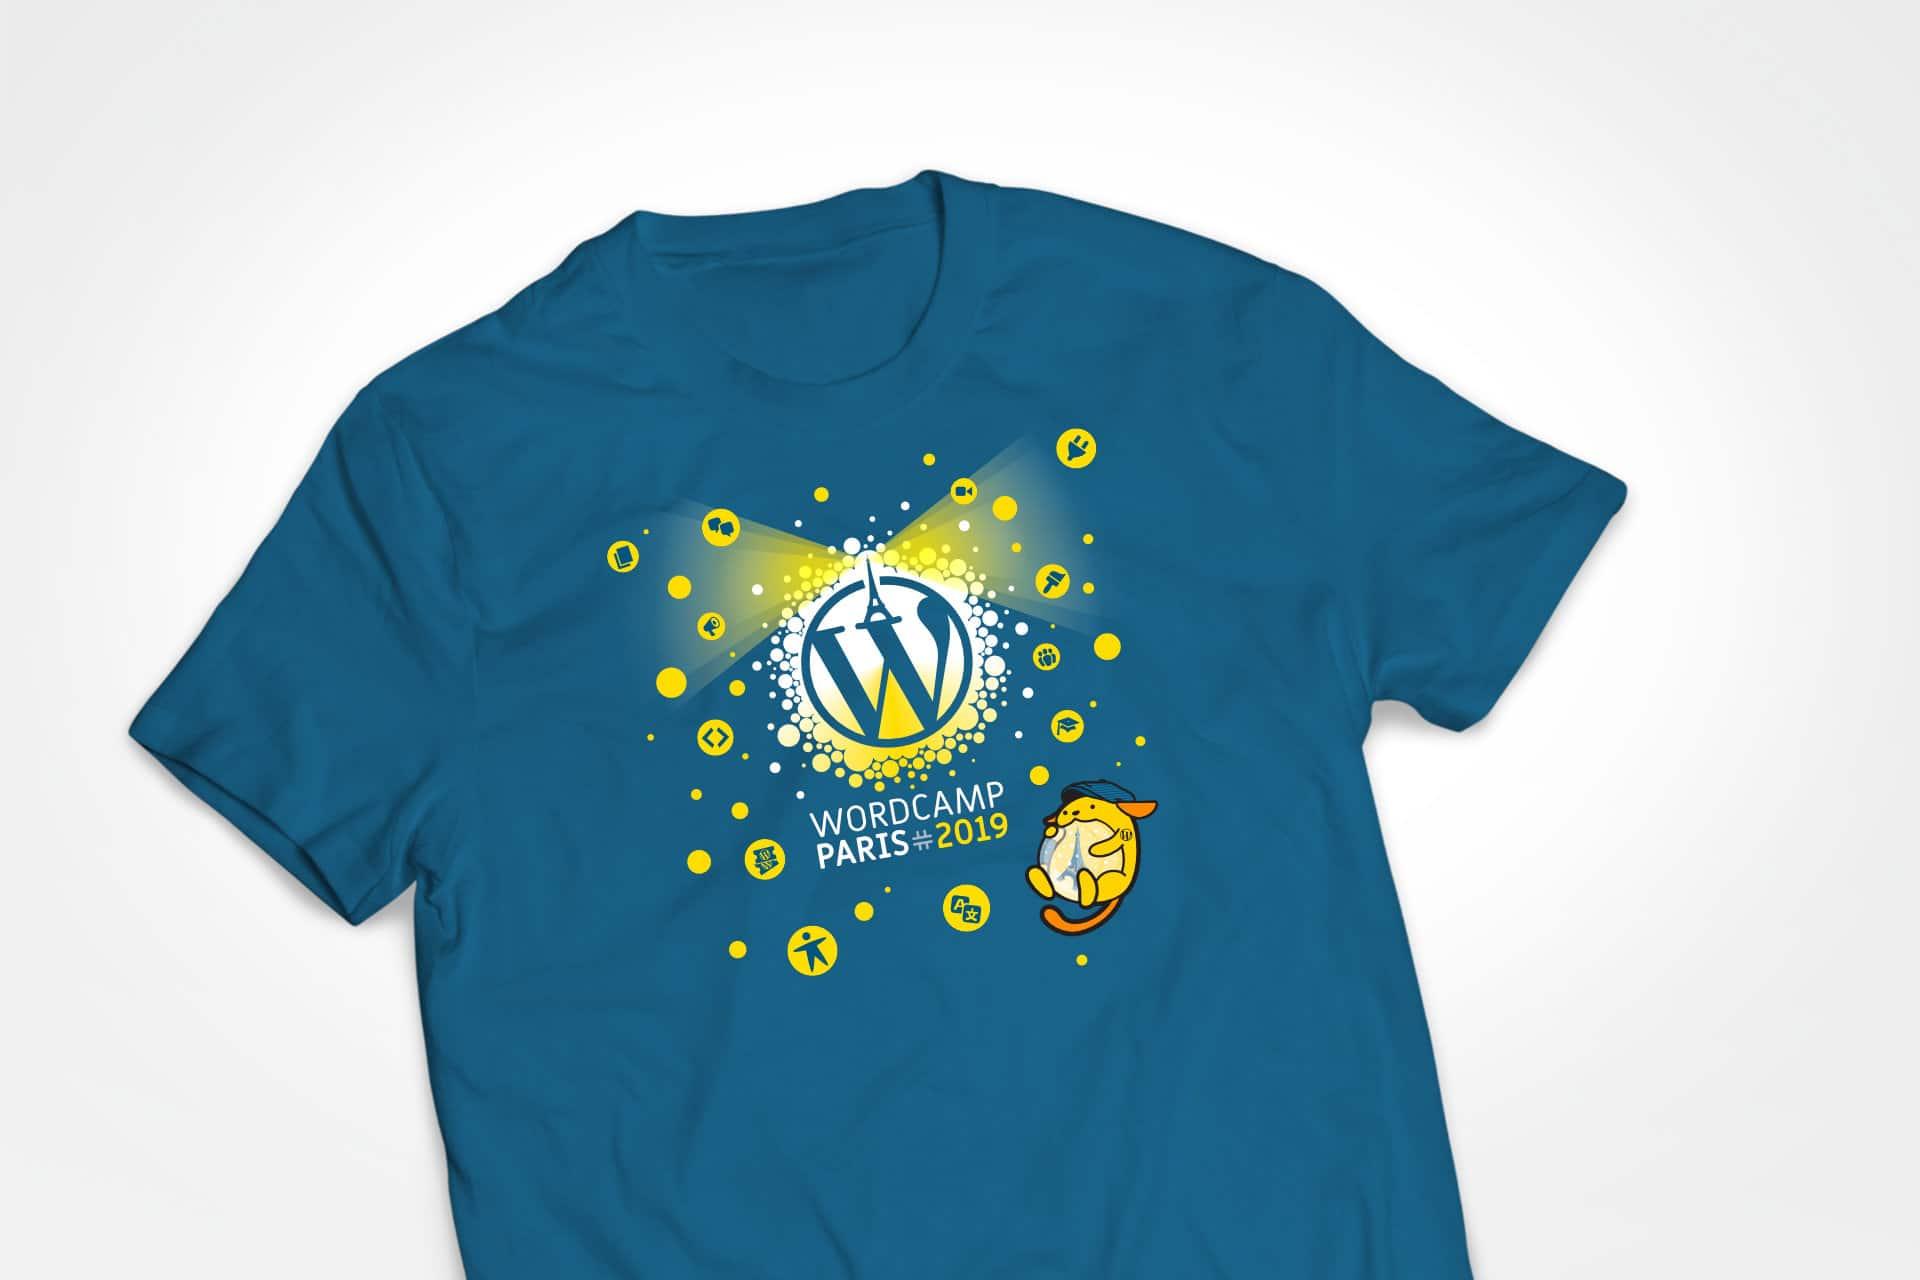 tshirt wordcamp paris 2019